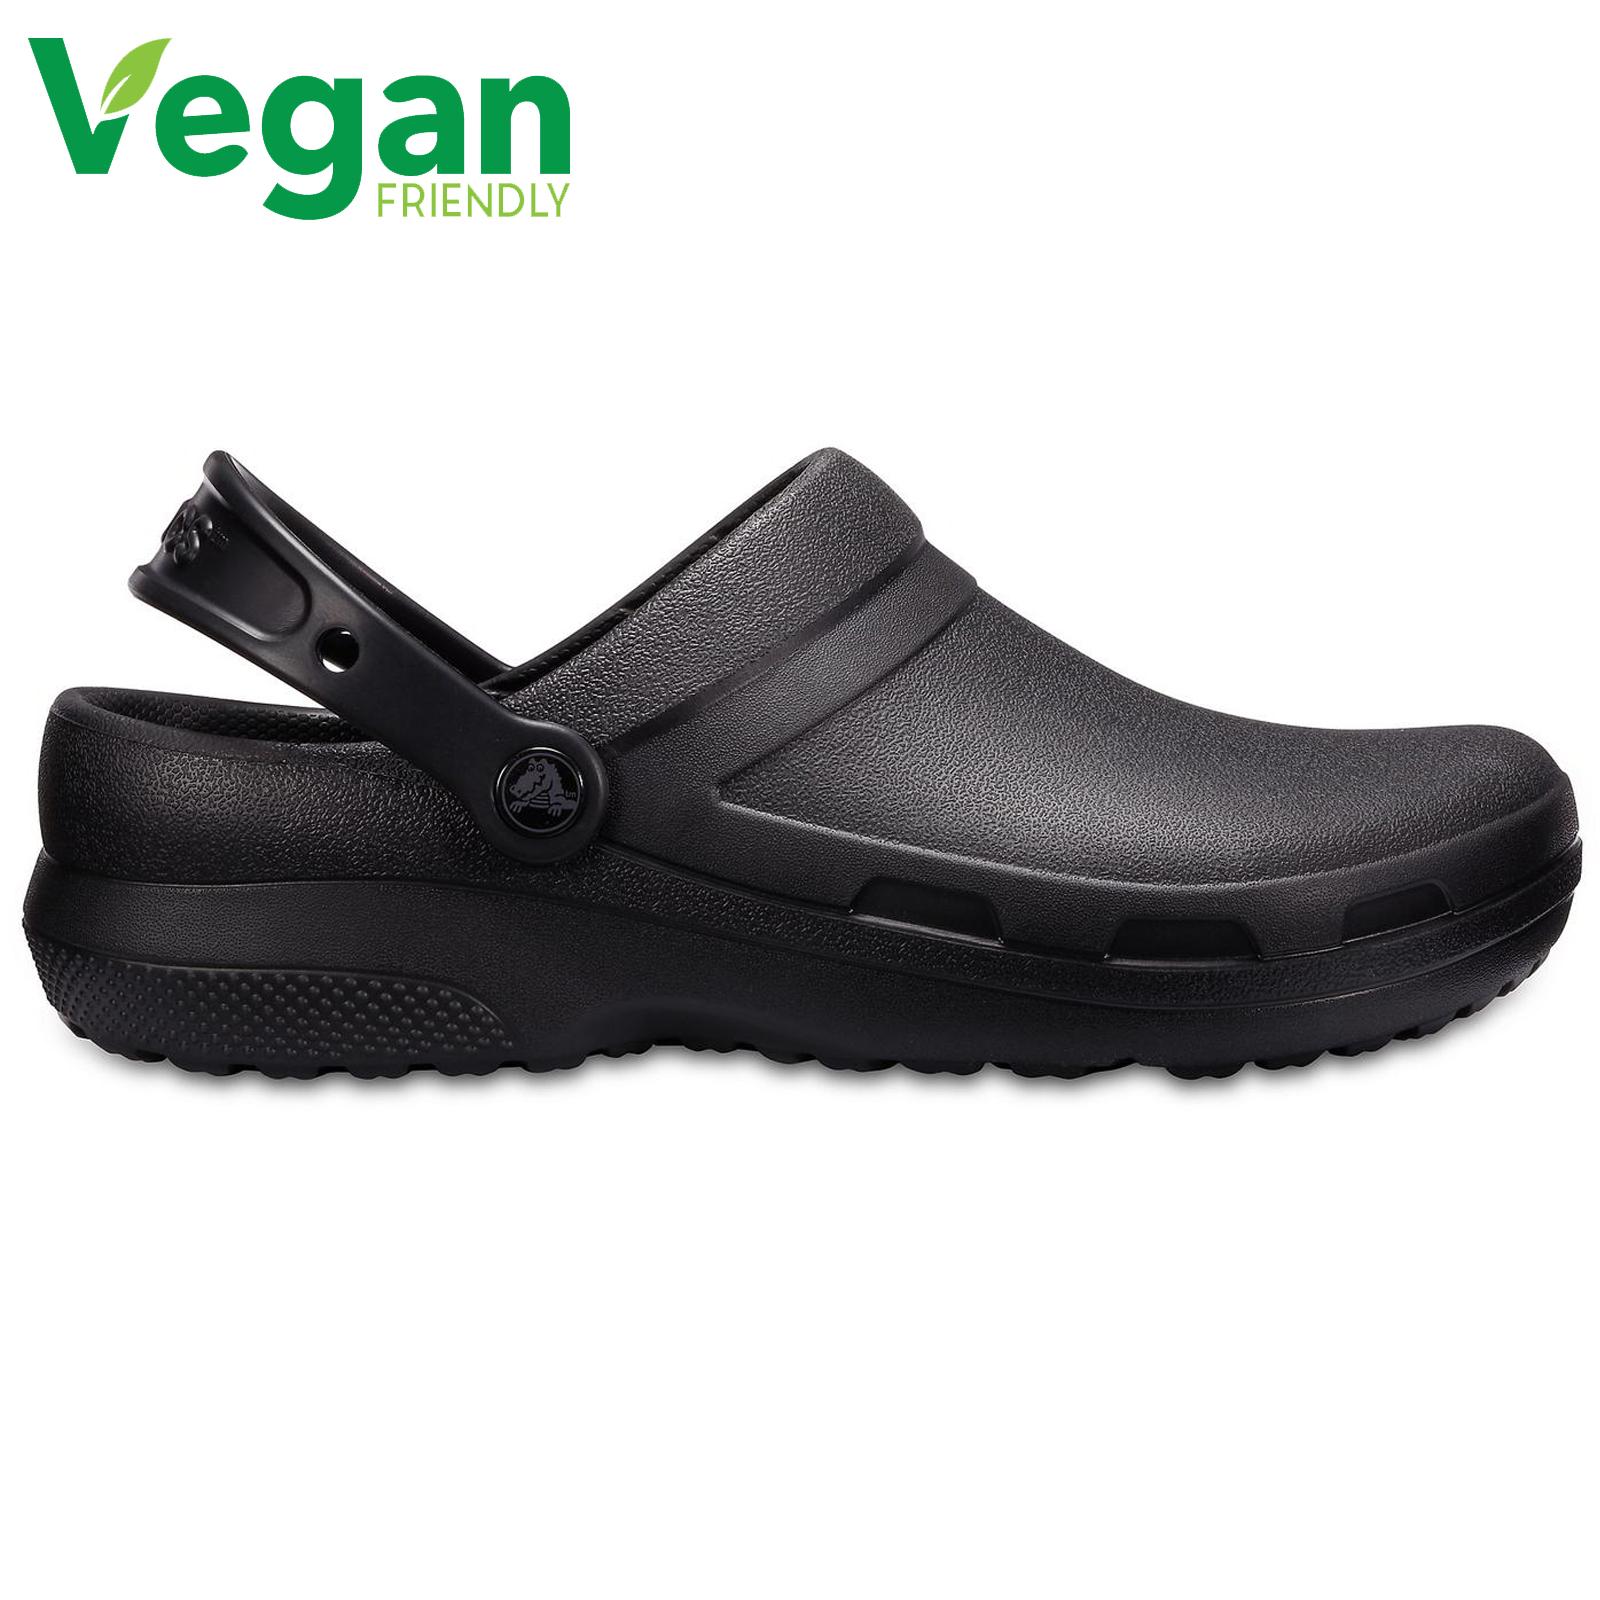 Crocs Mens Womens Specialist II Clogs Vegan Slip On Work Shoes - Black